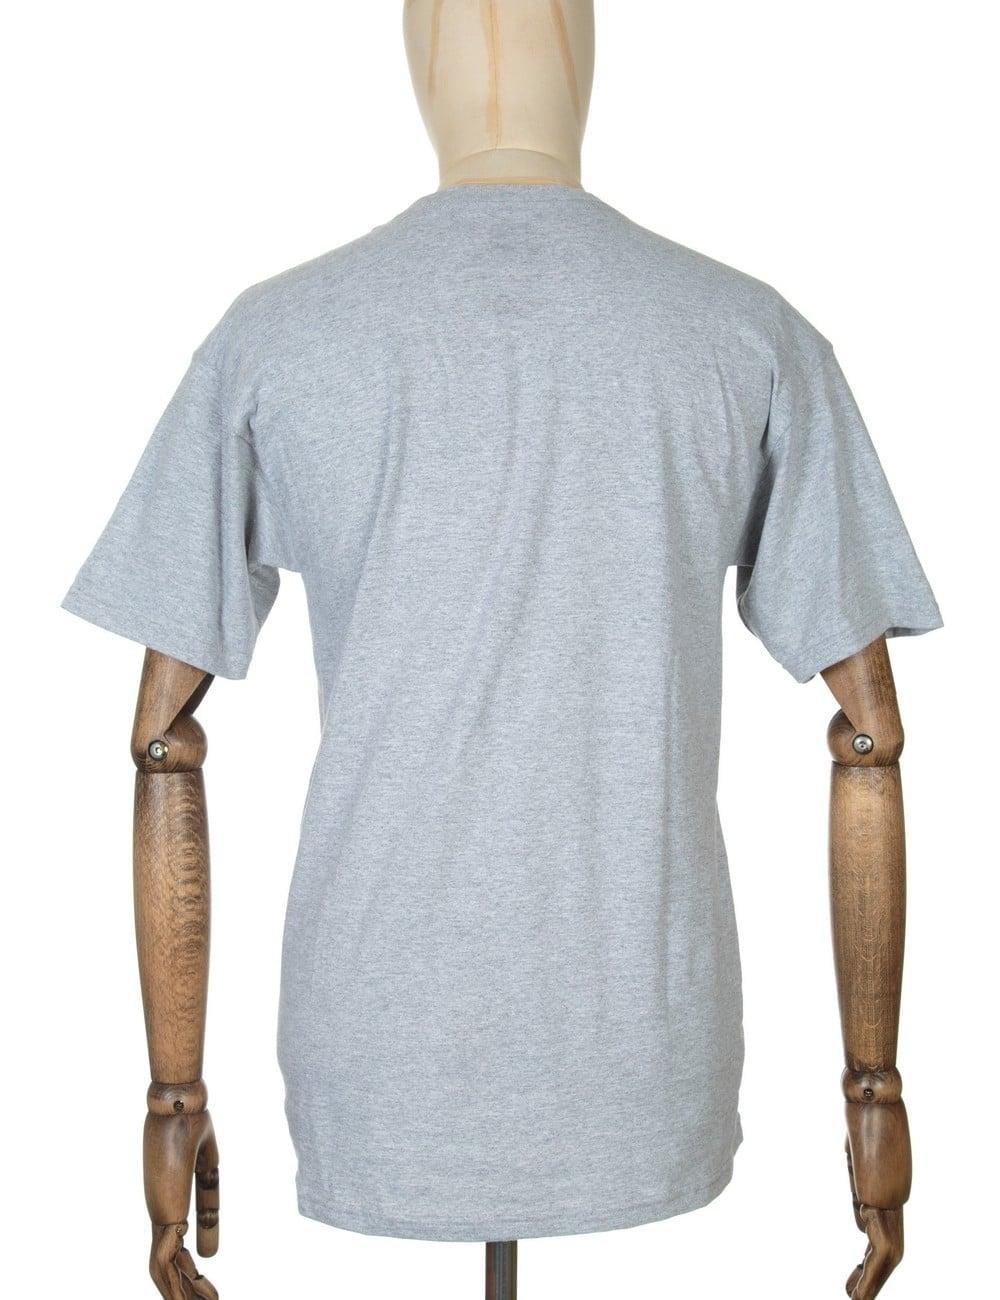 ecad6cc9778da Huf Tiger Camo Box Logo T-shirt - Grey Heather - Clothing from Fat ...